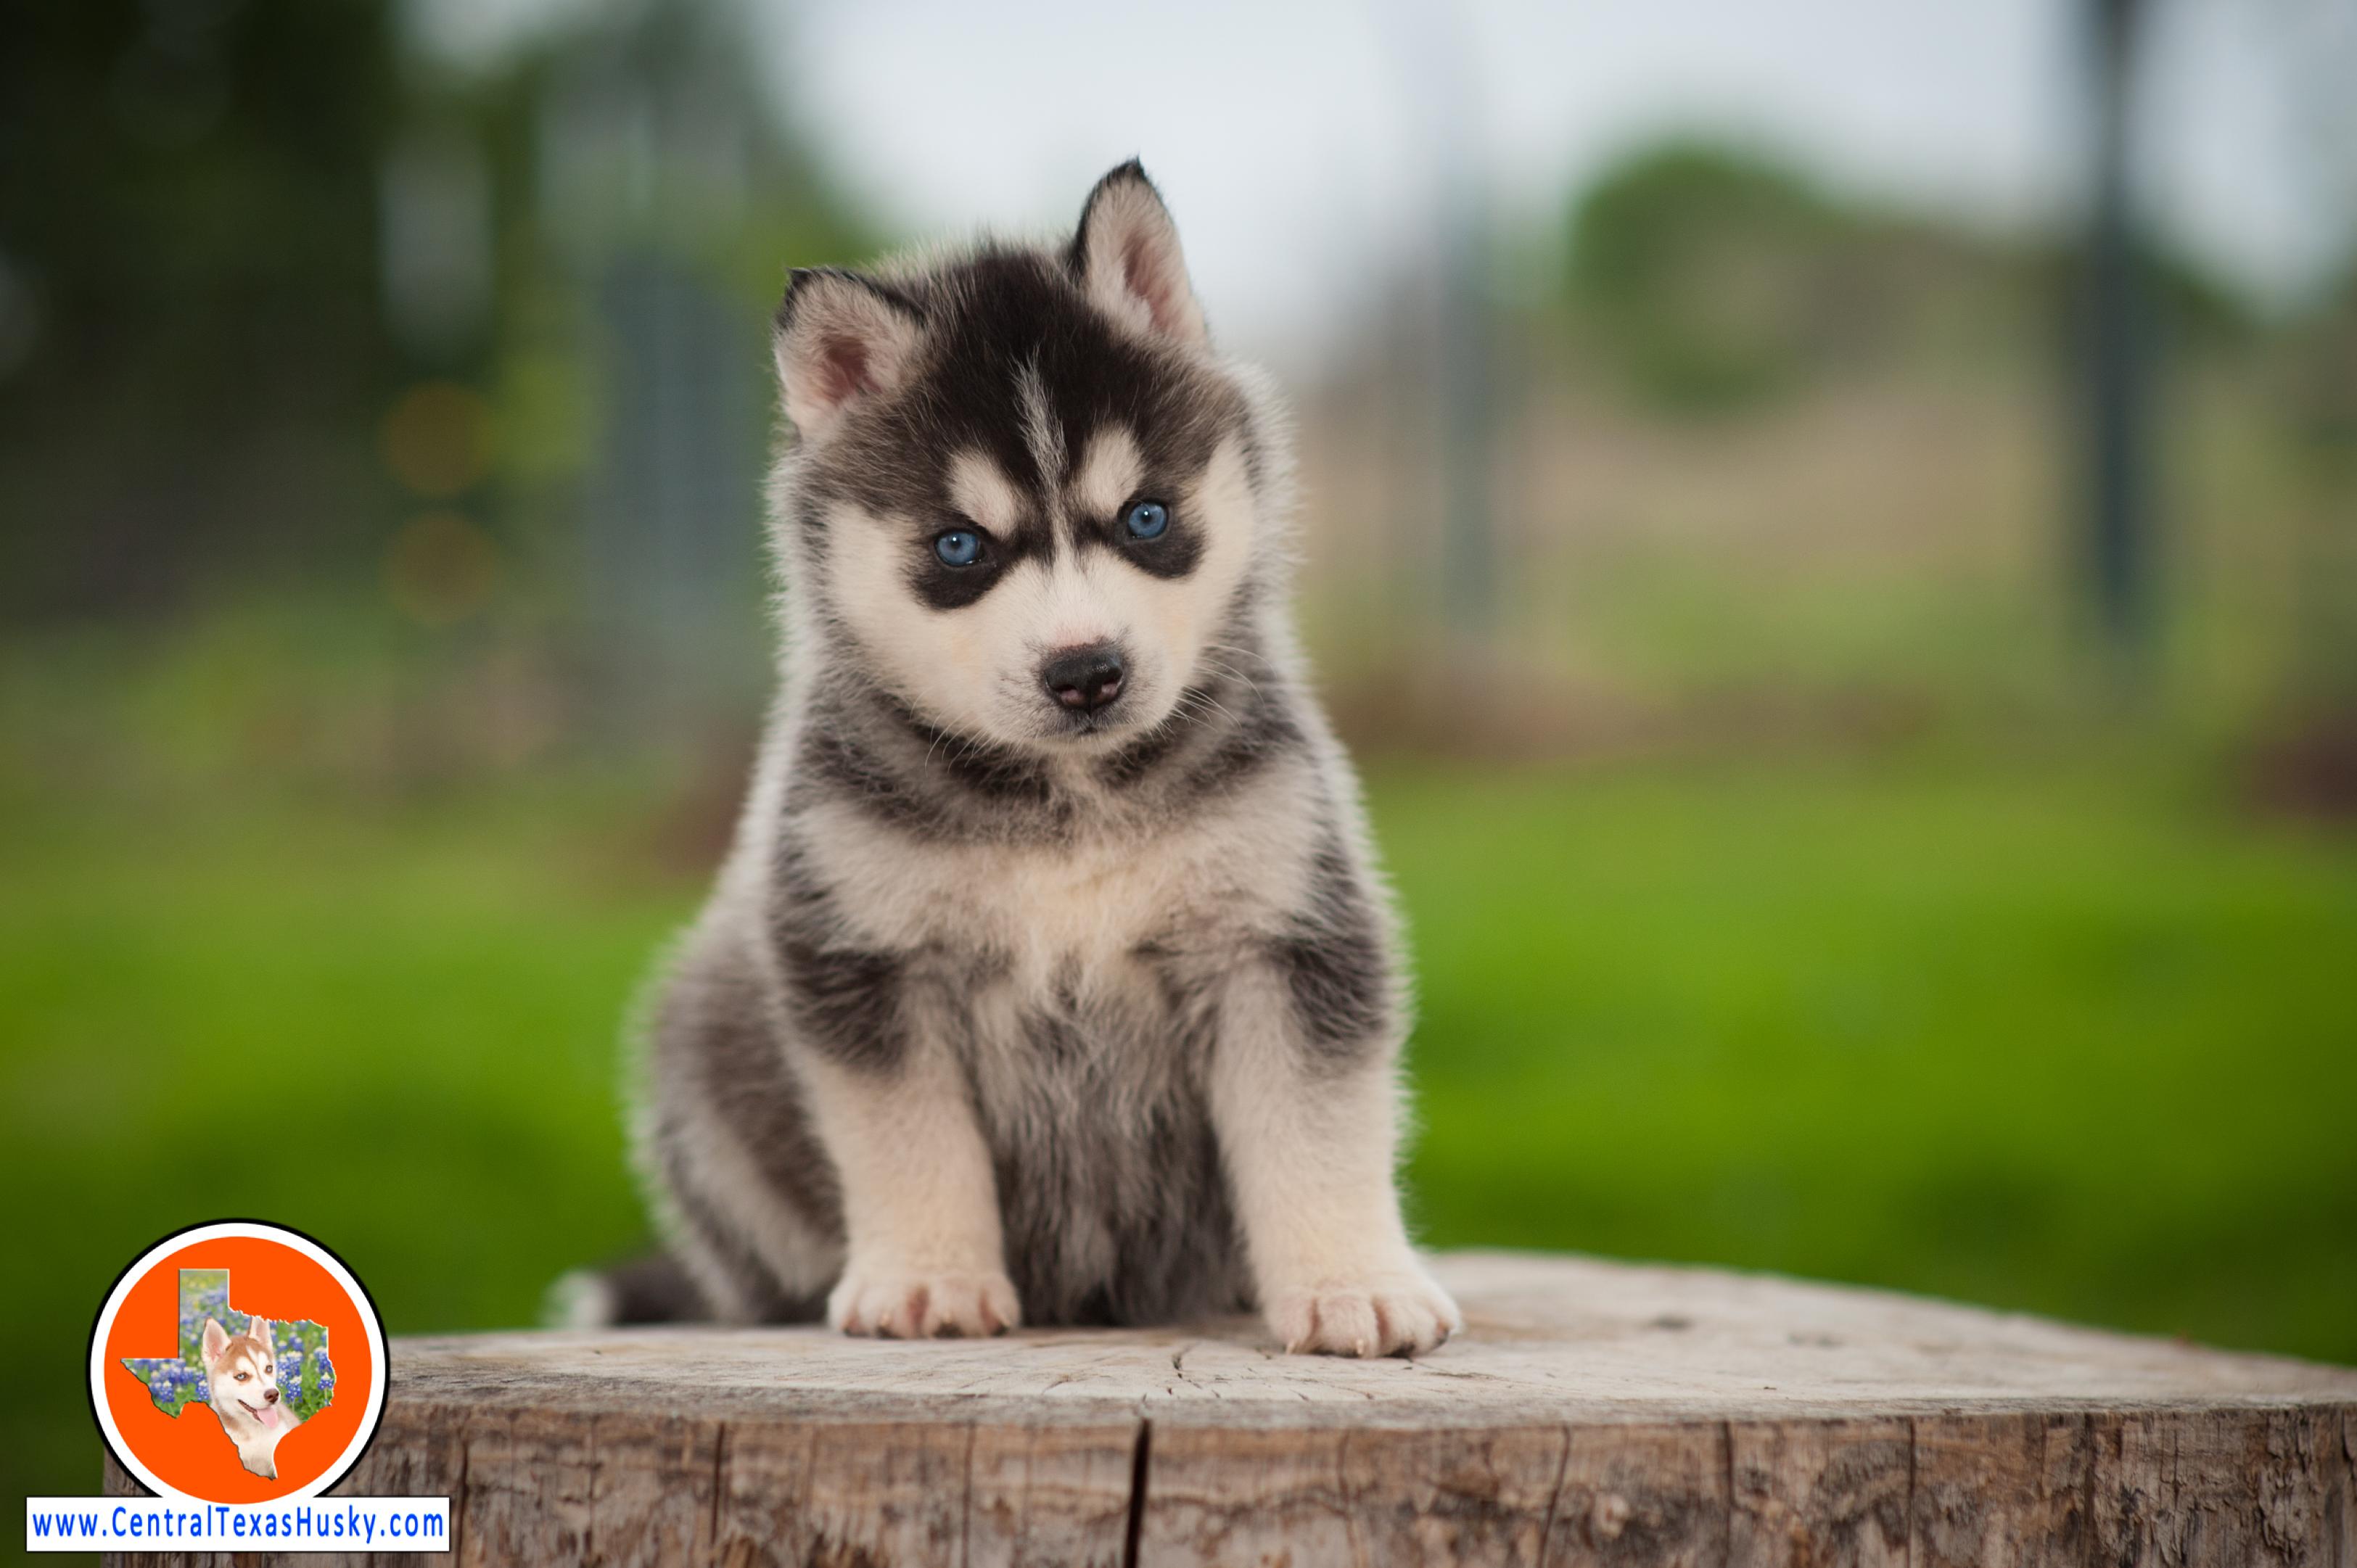 central-texas-husky_austin-siberian-husky-breeder_703957_20180324